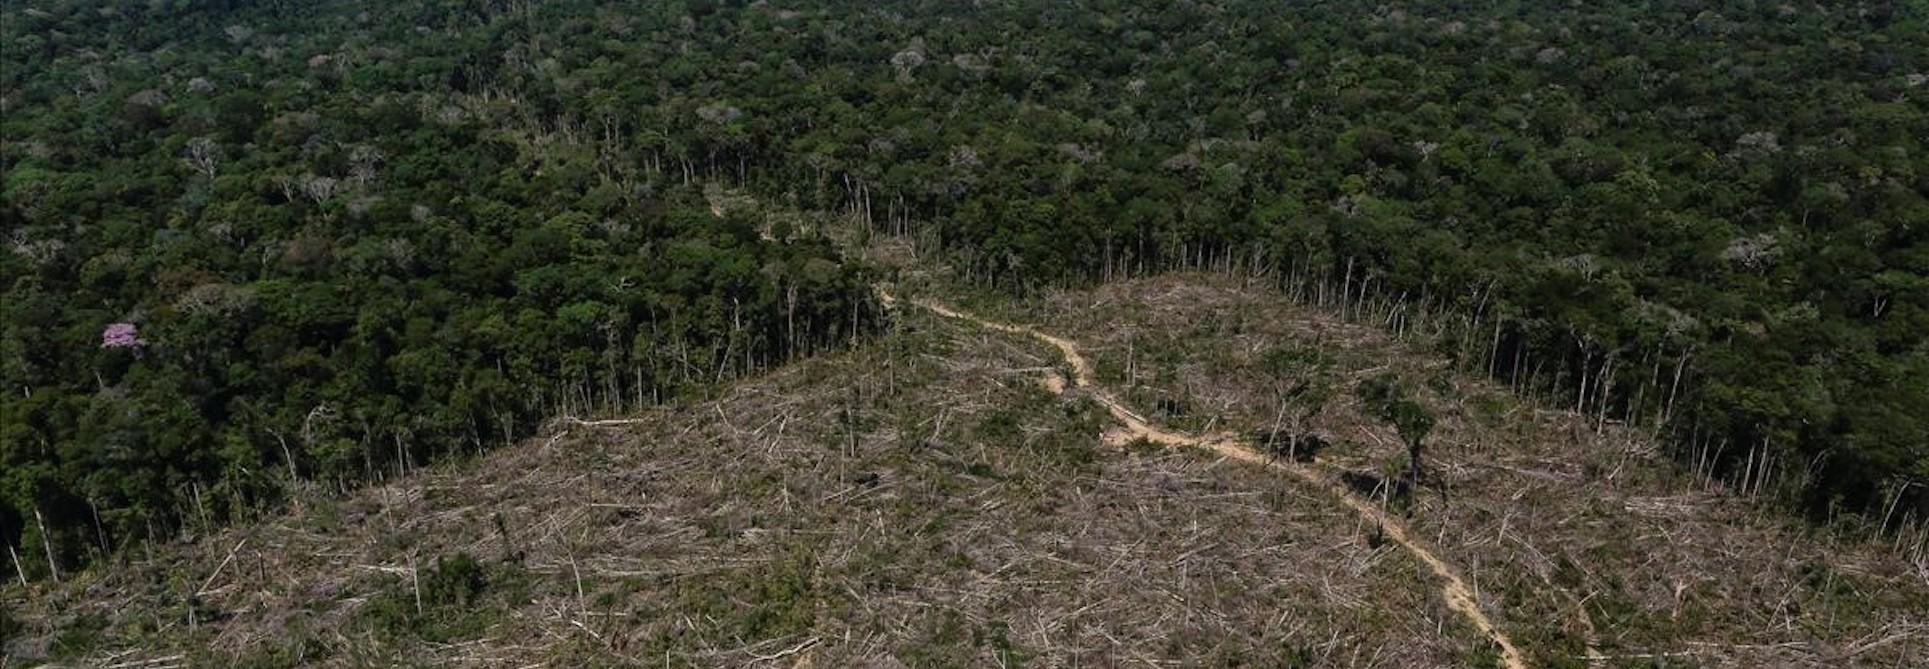 The Amazon in danger